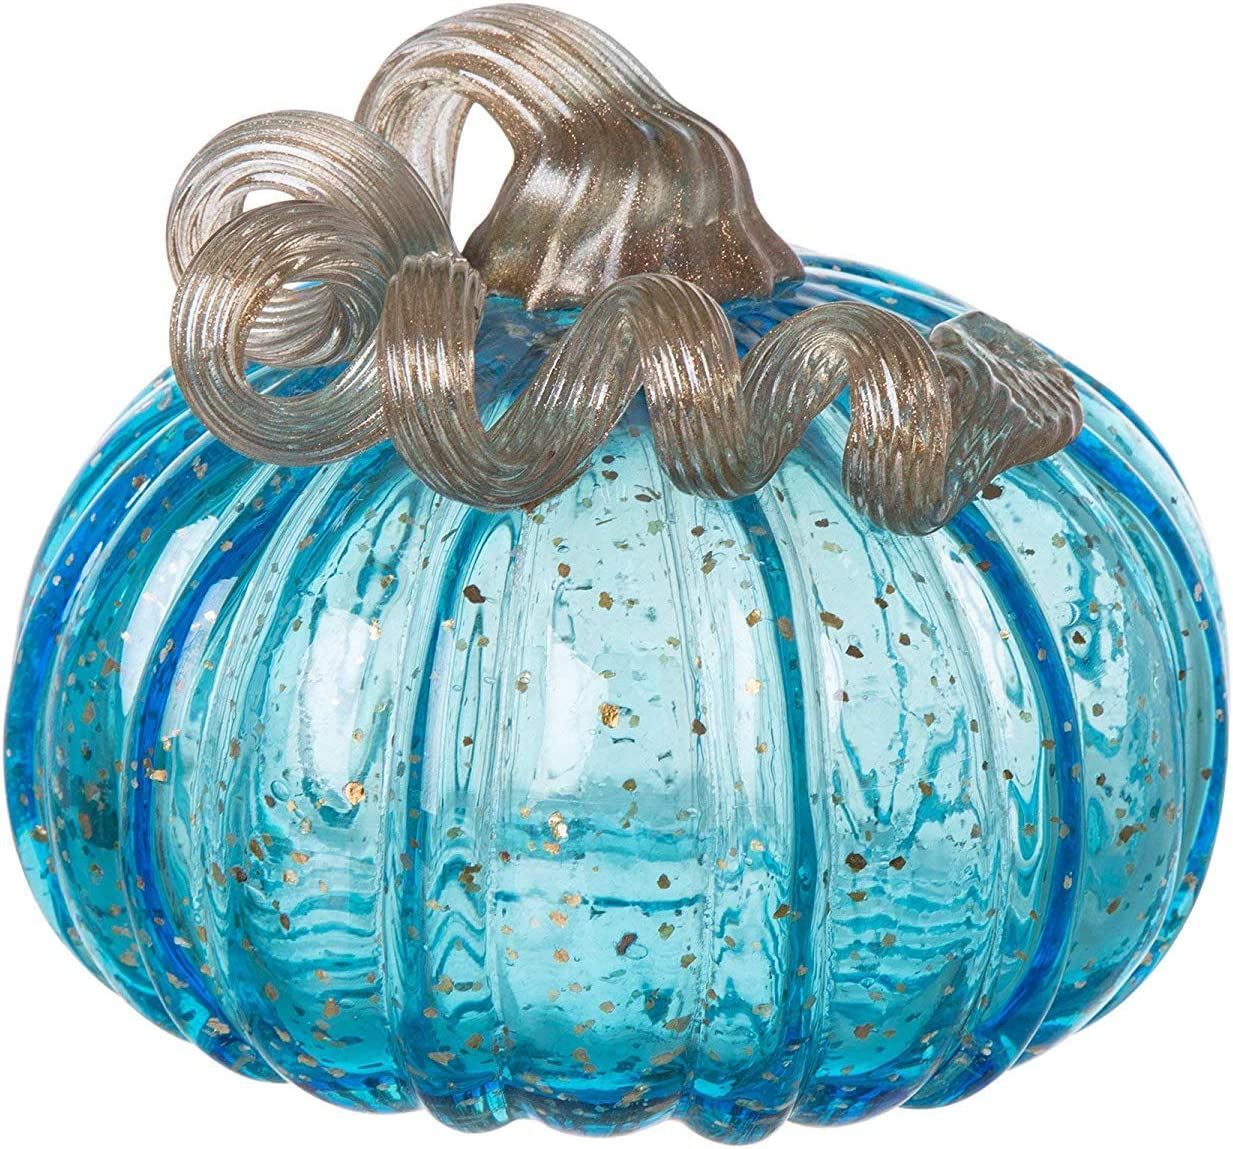 "Glitzhome 5.12"" Blue Handblown Glass Pumpkin Table Accent for Fall & Harvest Thanksgiving Decoration"